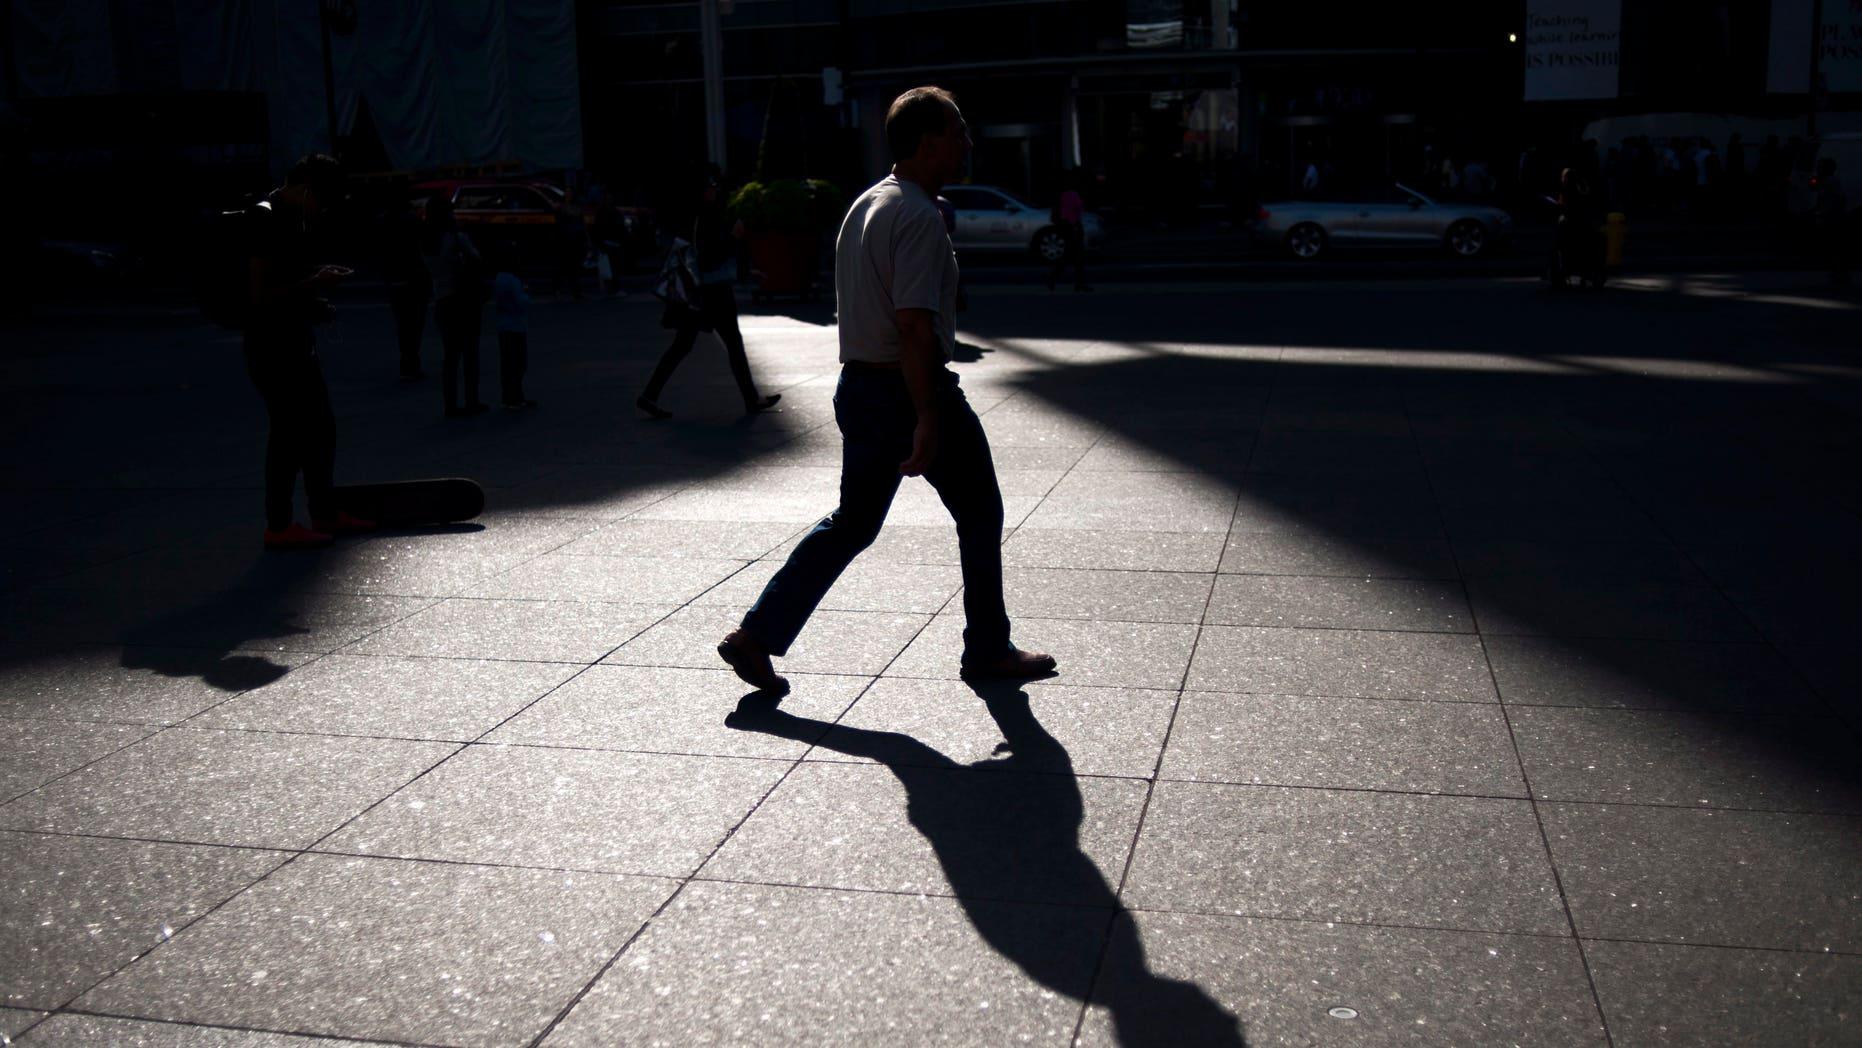 A person walks through Yonge and Dundas Square in Toronto, Friday, Sept, 25, 2015. (Marta Iwanek/The Canadian Press via AP) MANDATORY CREDIT